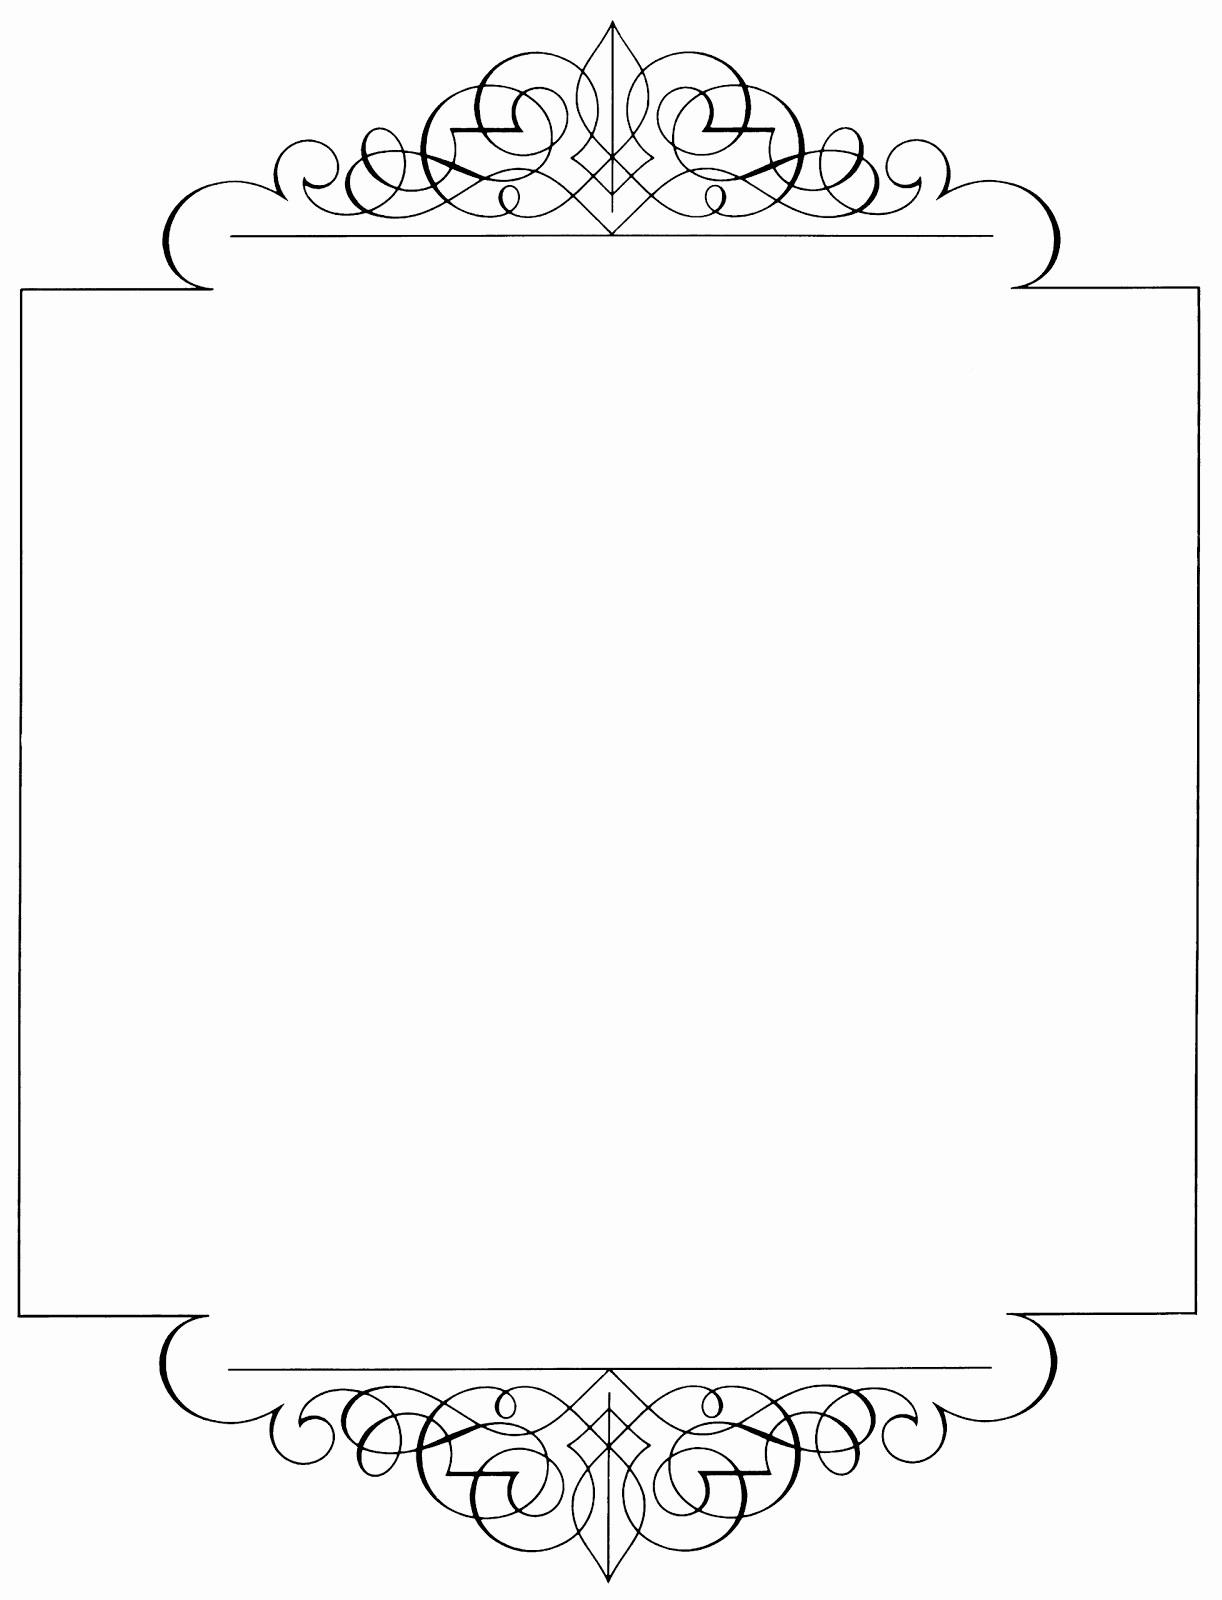 Wedding Borders for Microsoft Word Beautiful Free Elegant Borders and Frames High Quality Wallpaper